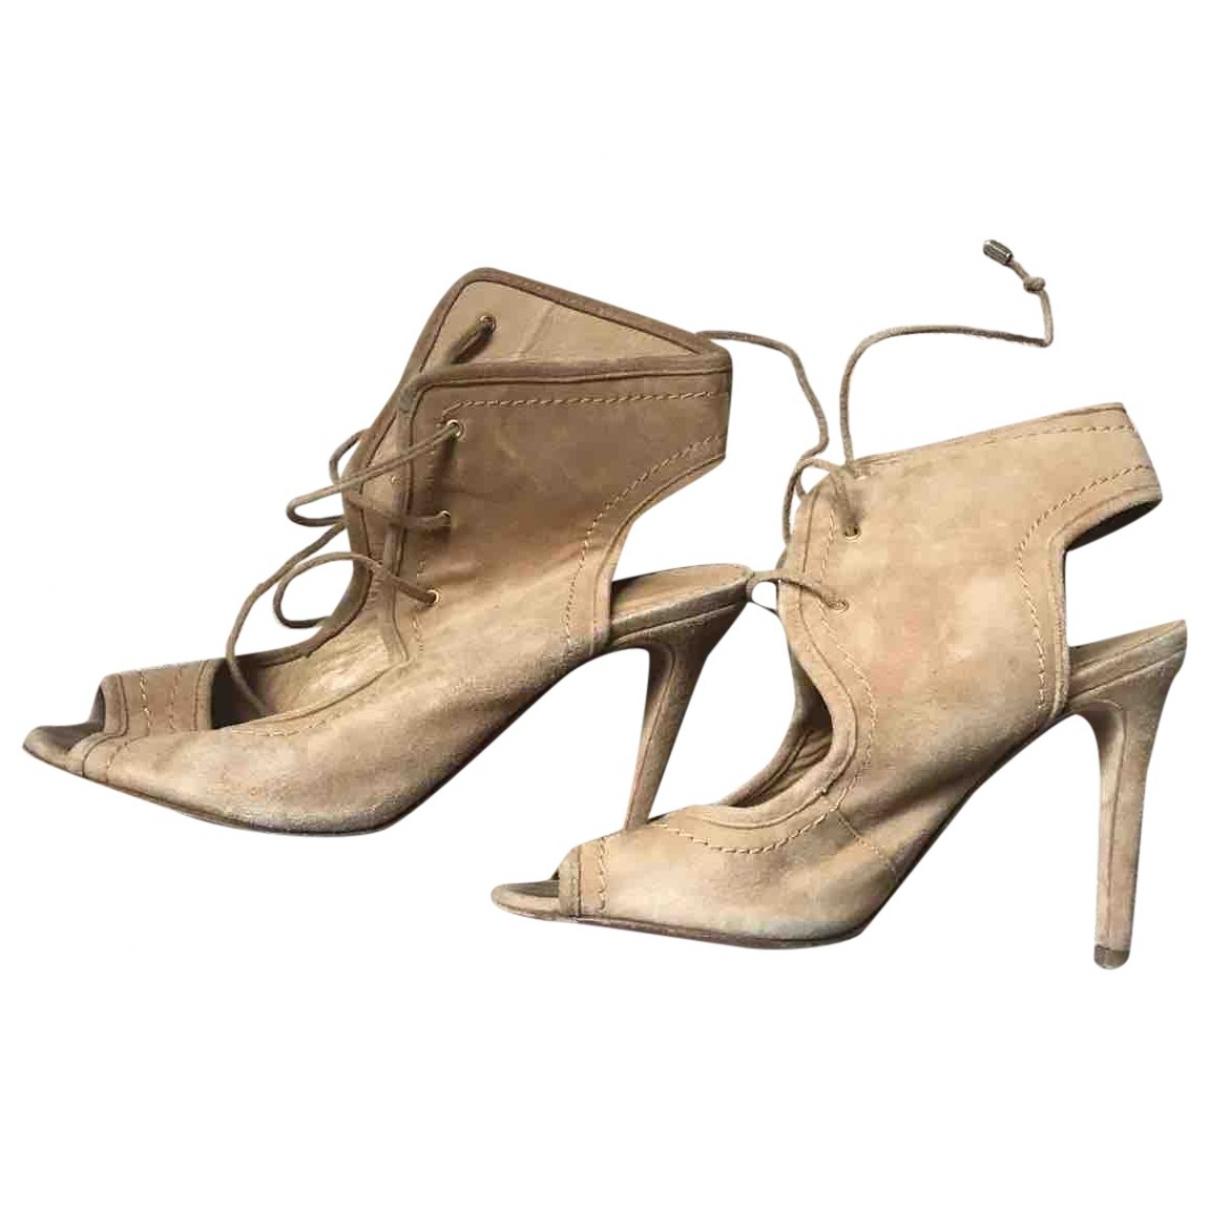 Carolina Herrera - Sandales   pour femme en suede - beige